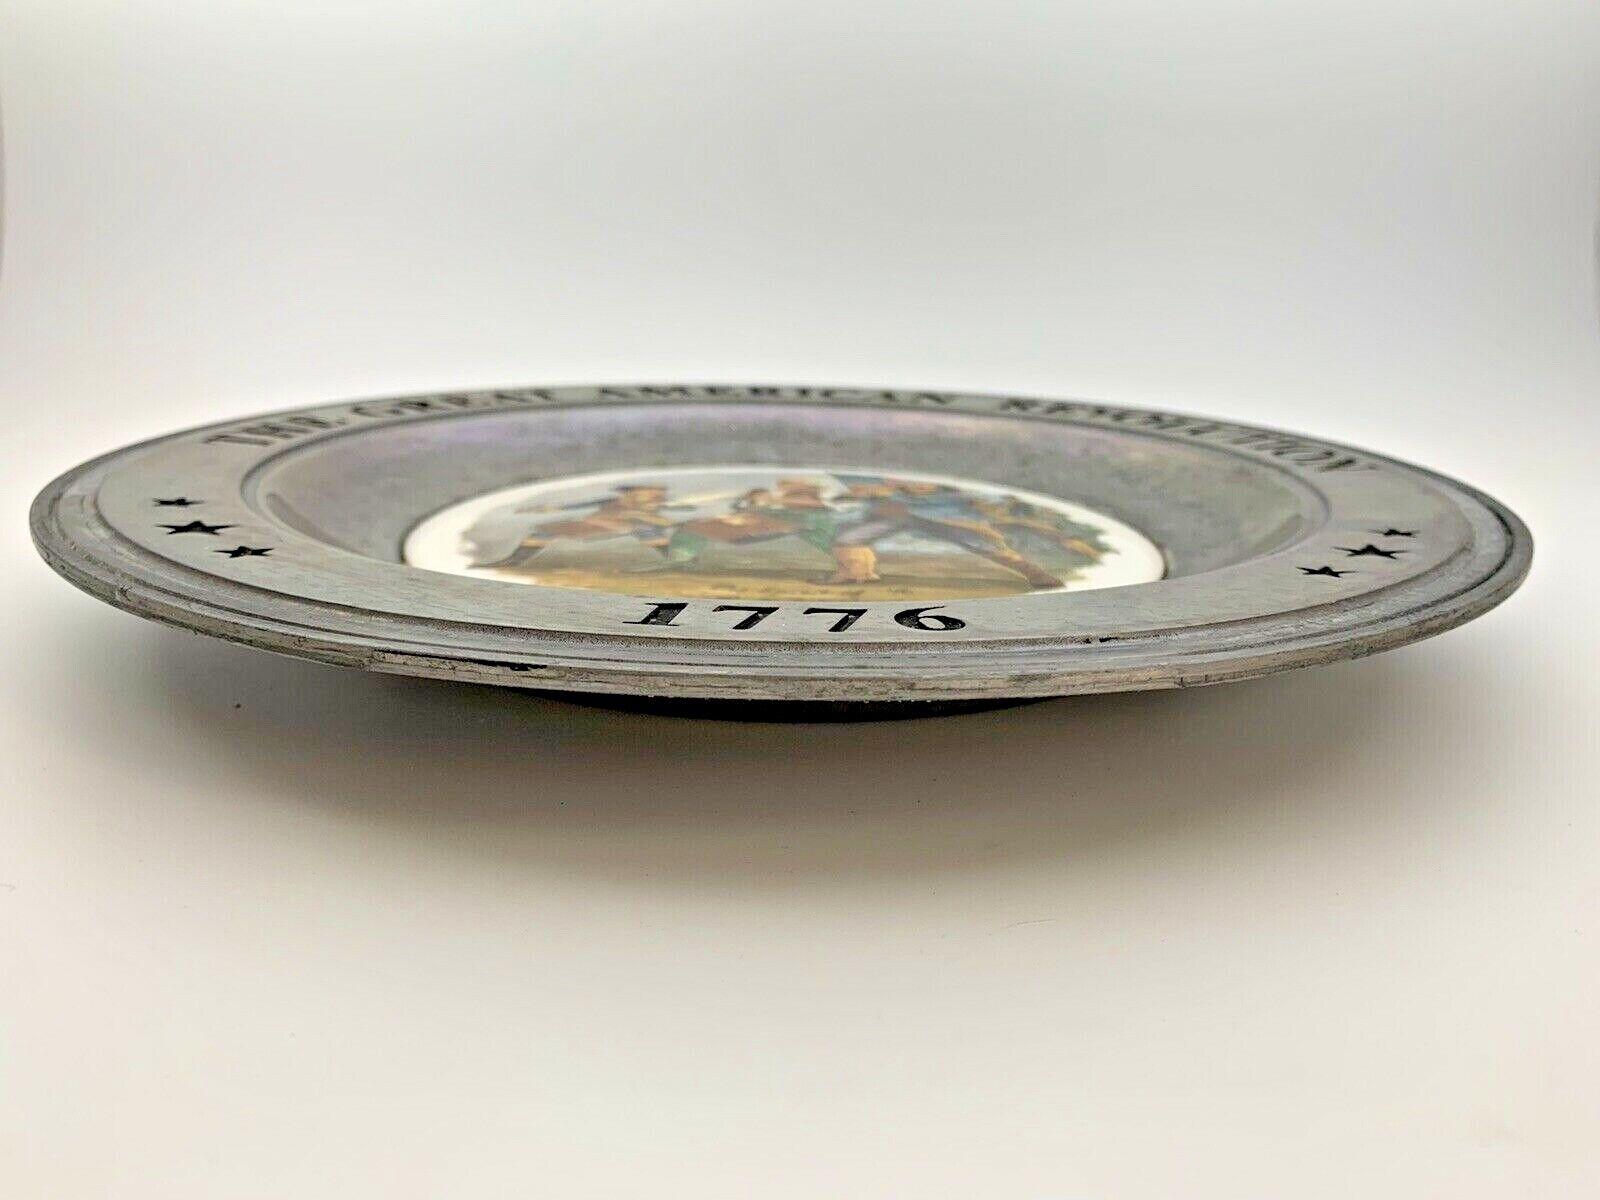 Armetale /& Ceramic Commemorative Plate Revolutionary War